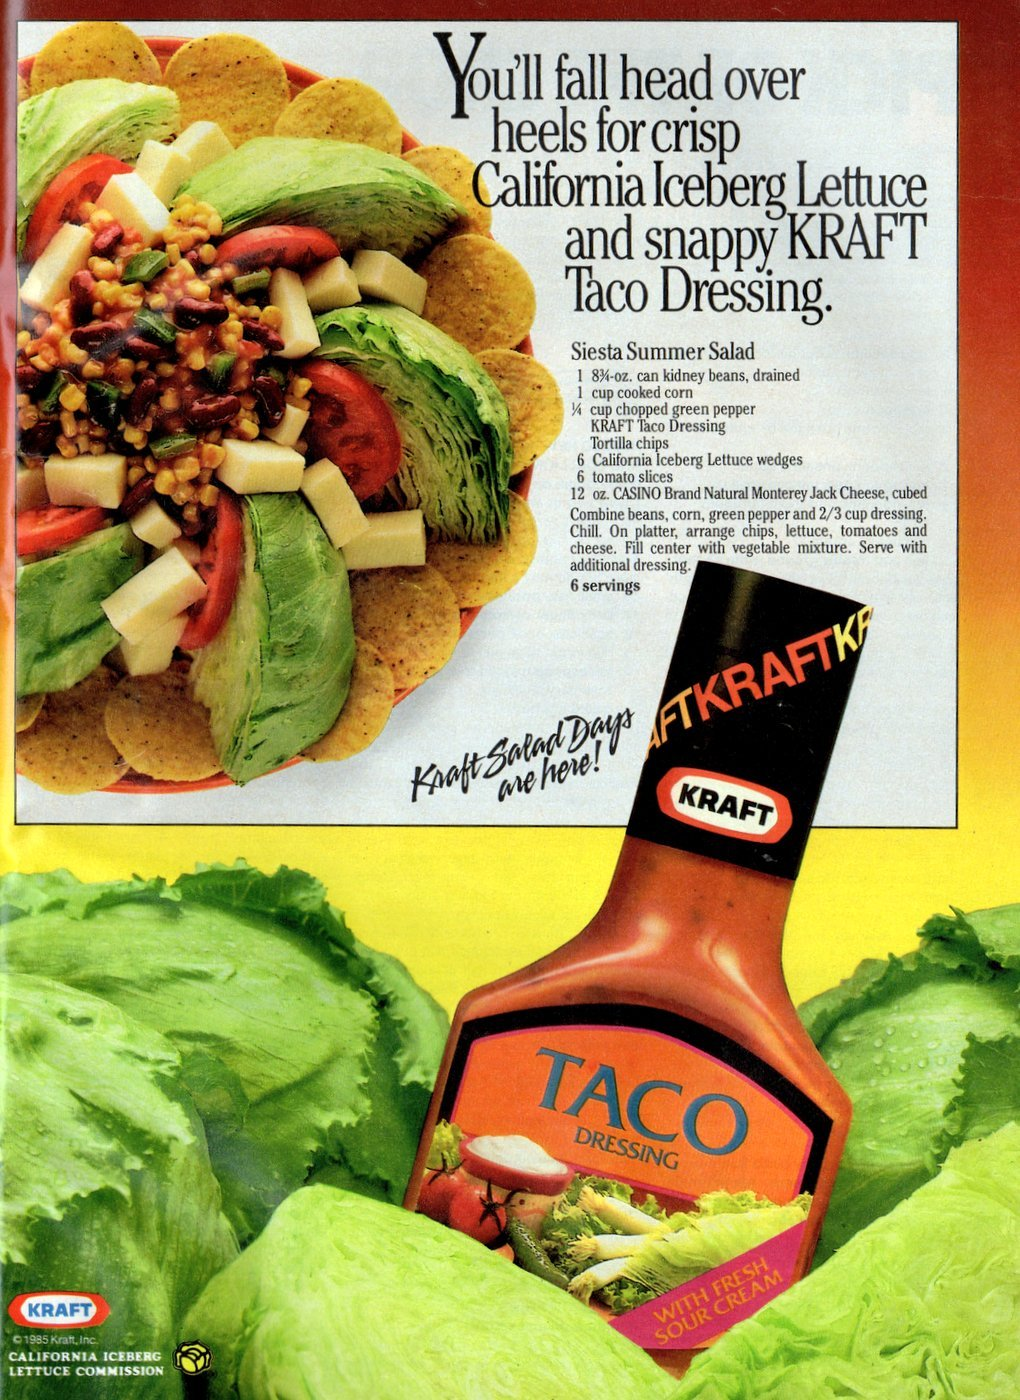 Siesta summer salad - Retro taco dressing recipe (1985)